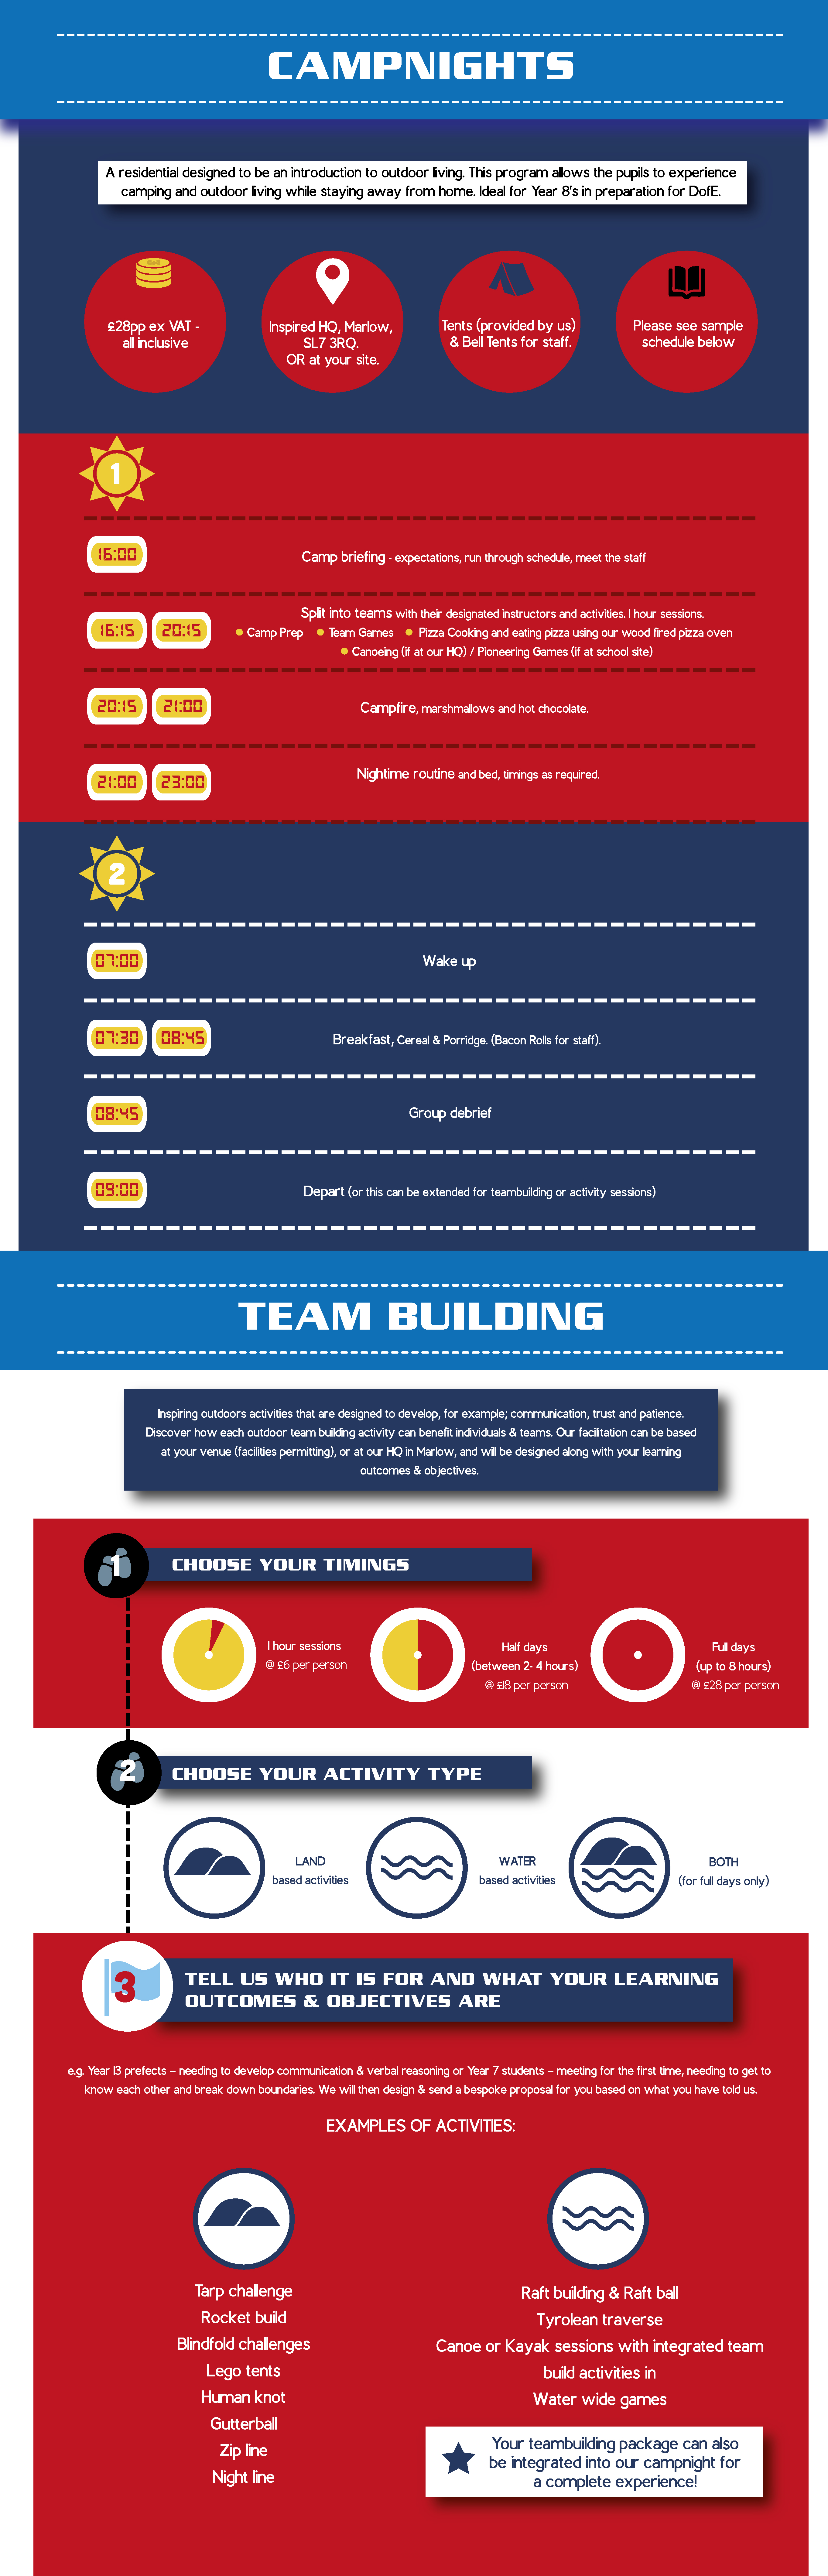 campnights-teambuilding-infographic-jpg